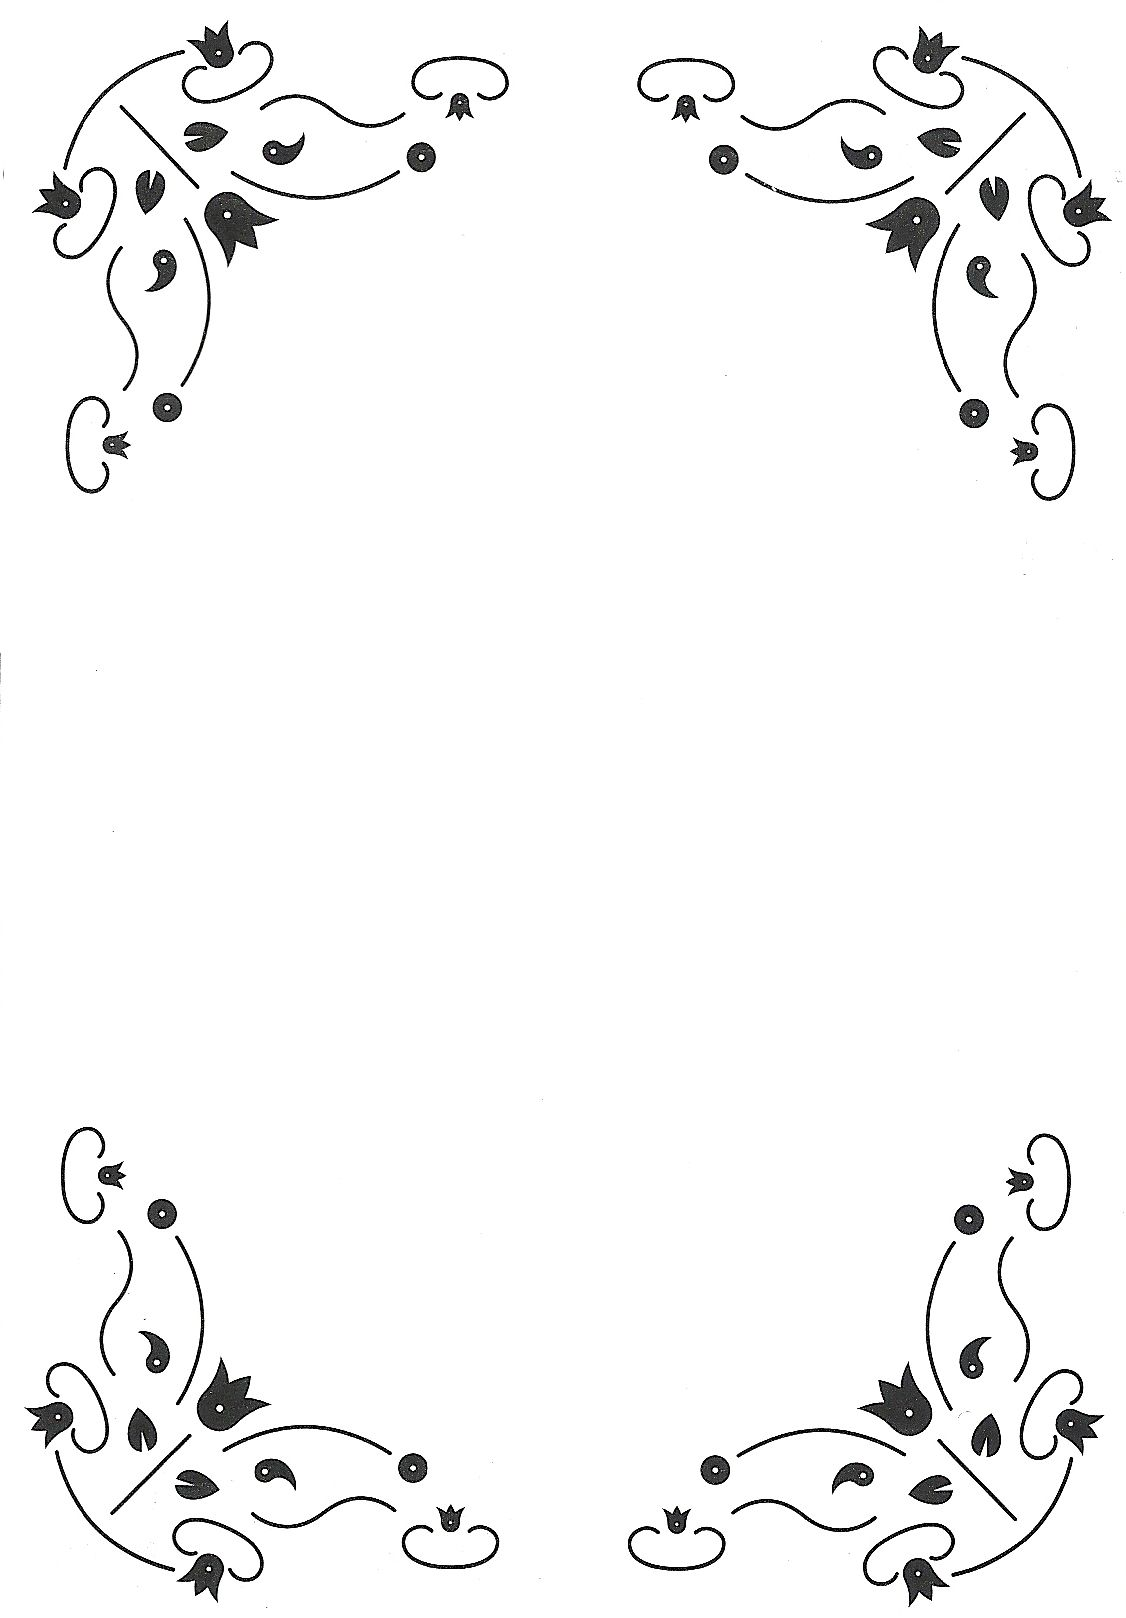 rechthoek | parchment | Pinterest | Marcos para cartas, Hojas para ...